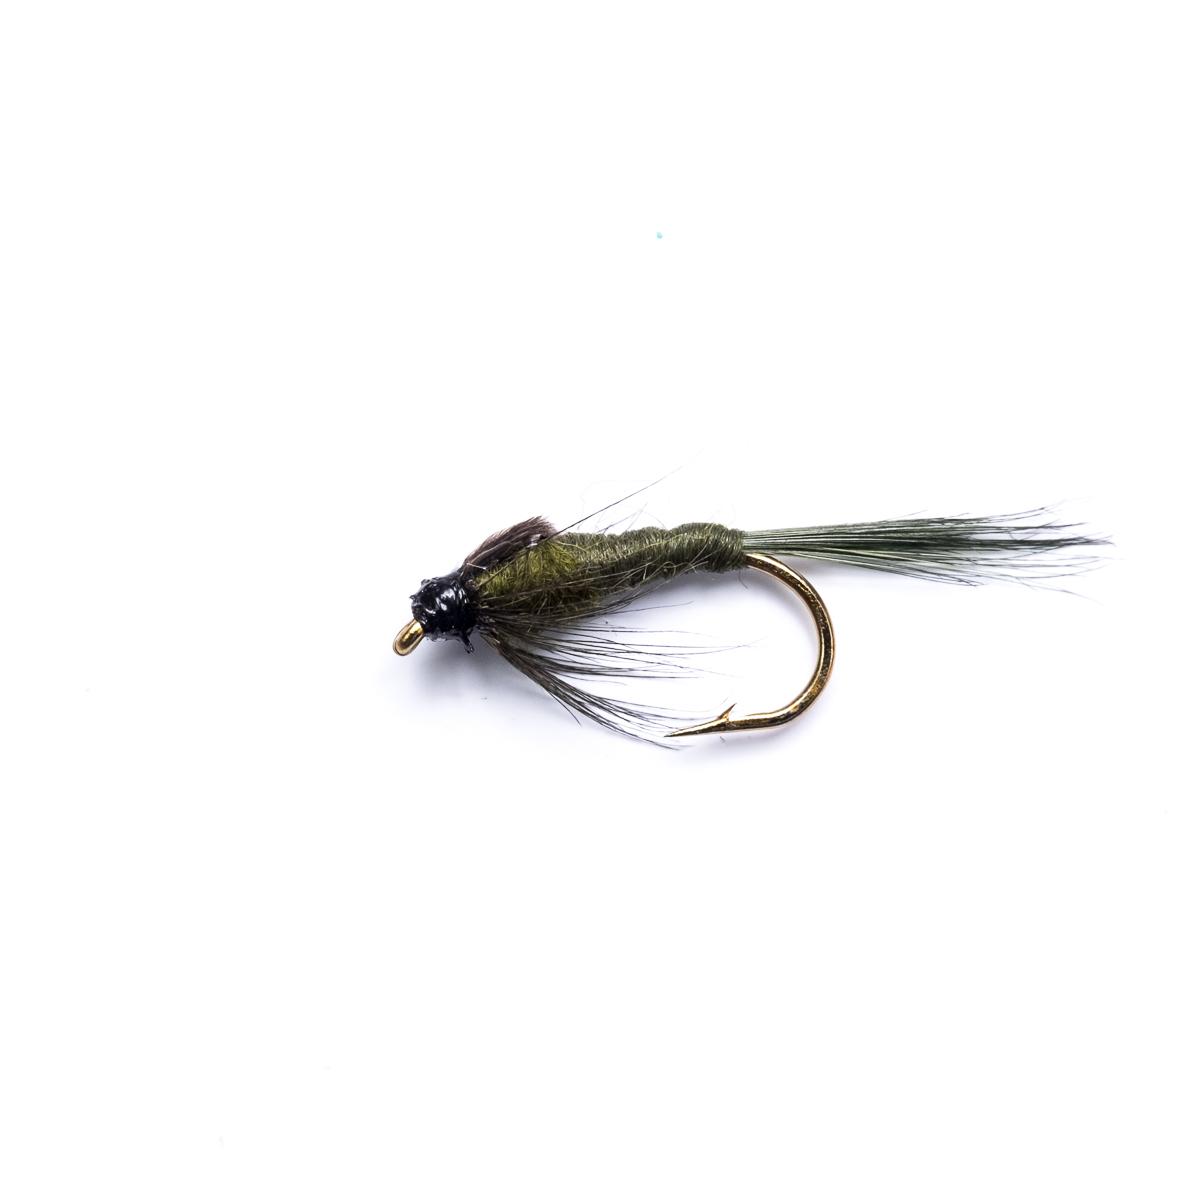 Pheasant Tail /& Black pheasant 18 Gold Head Nymphs Trout Fly fishing Flies GRHE